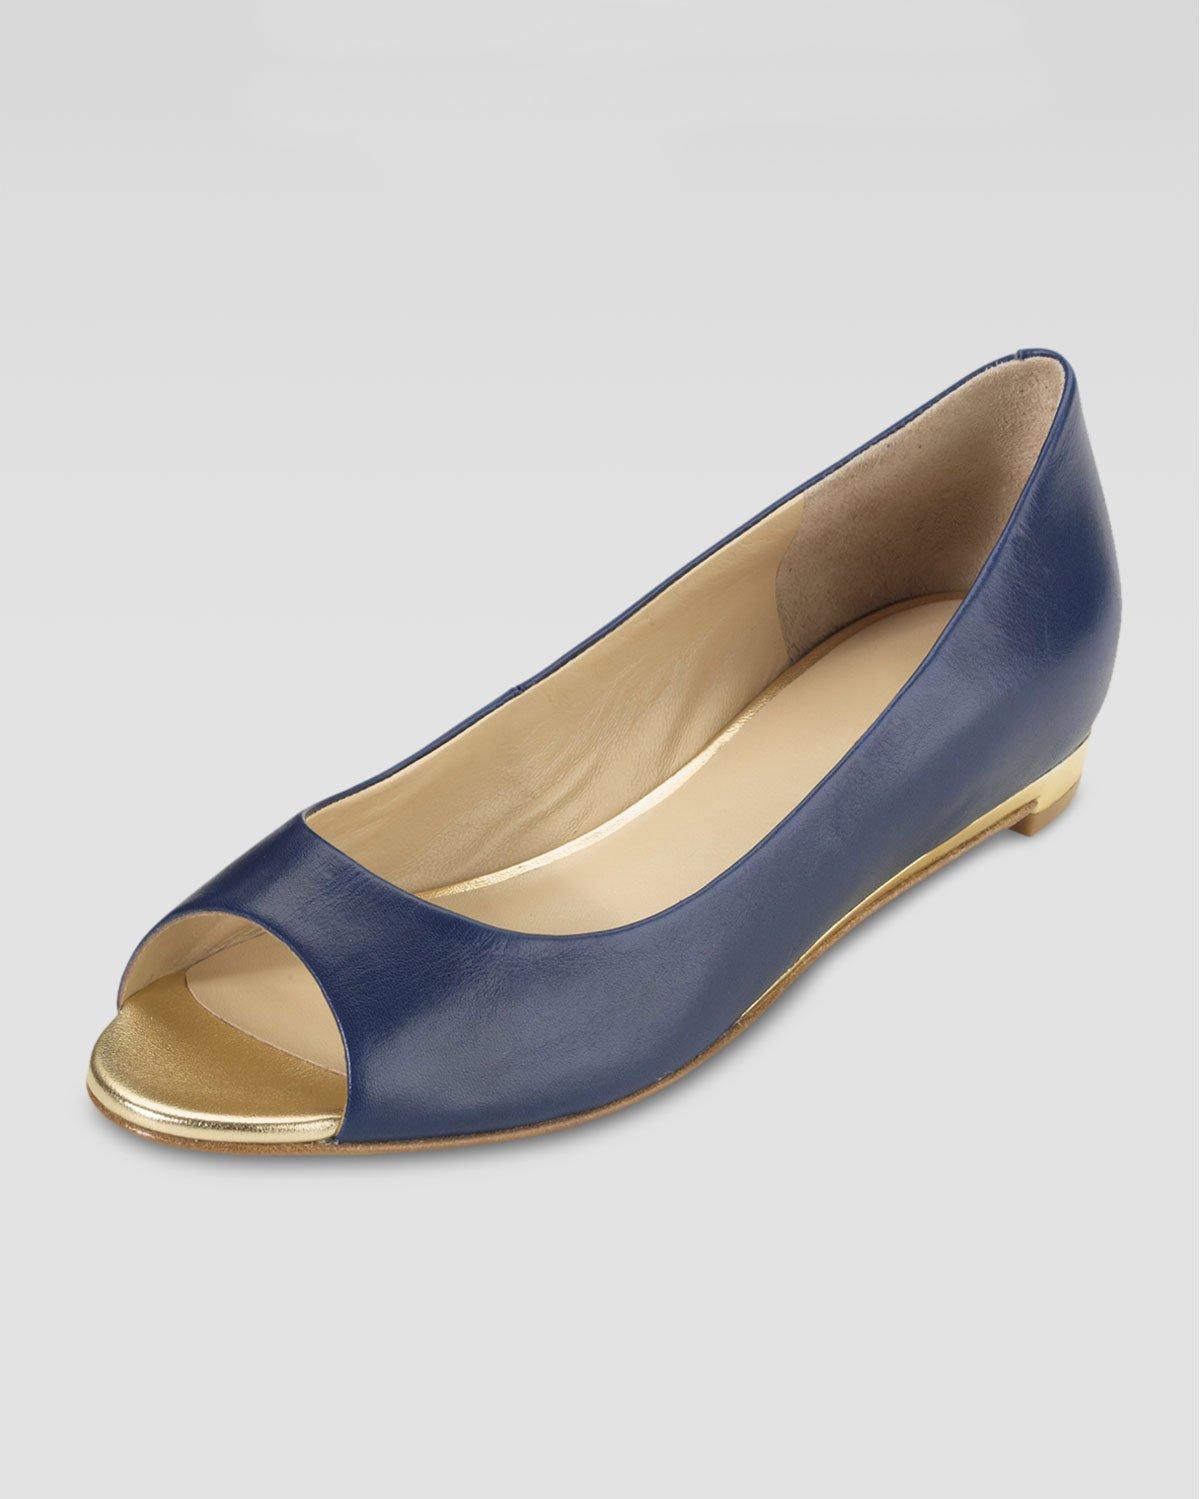 Flat Shoes Navy Blue